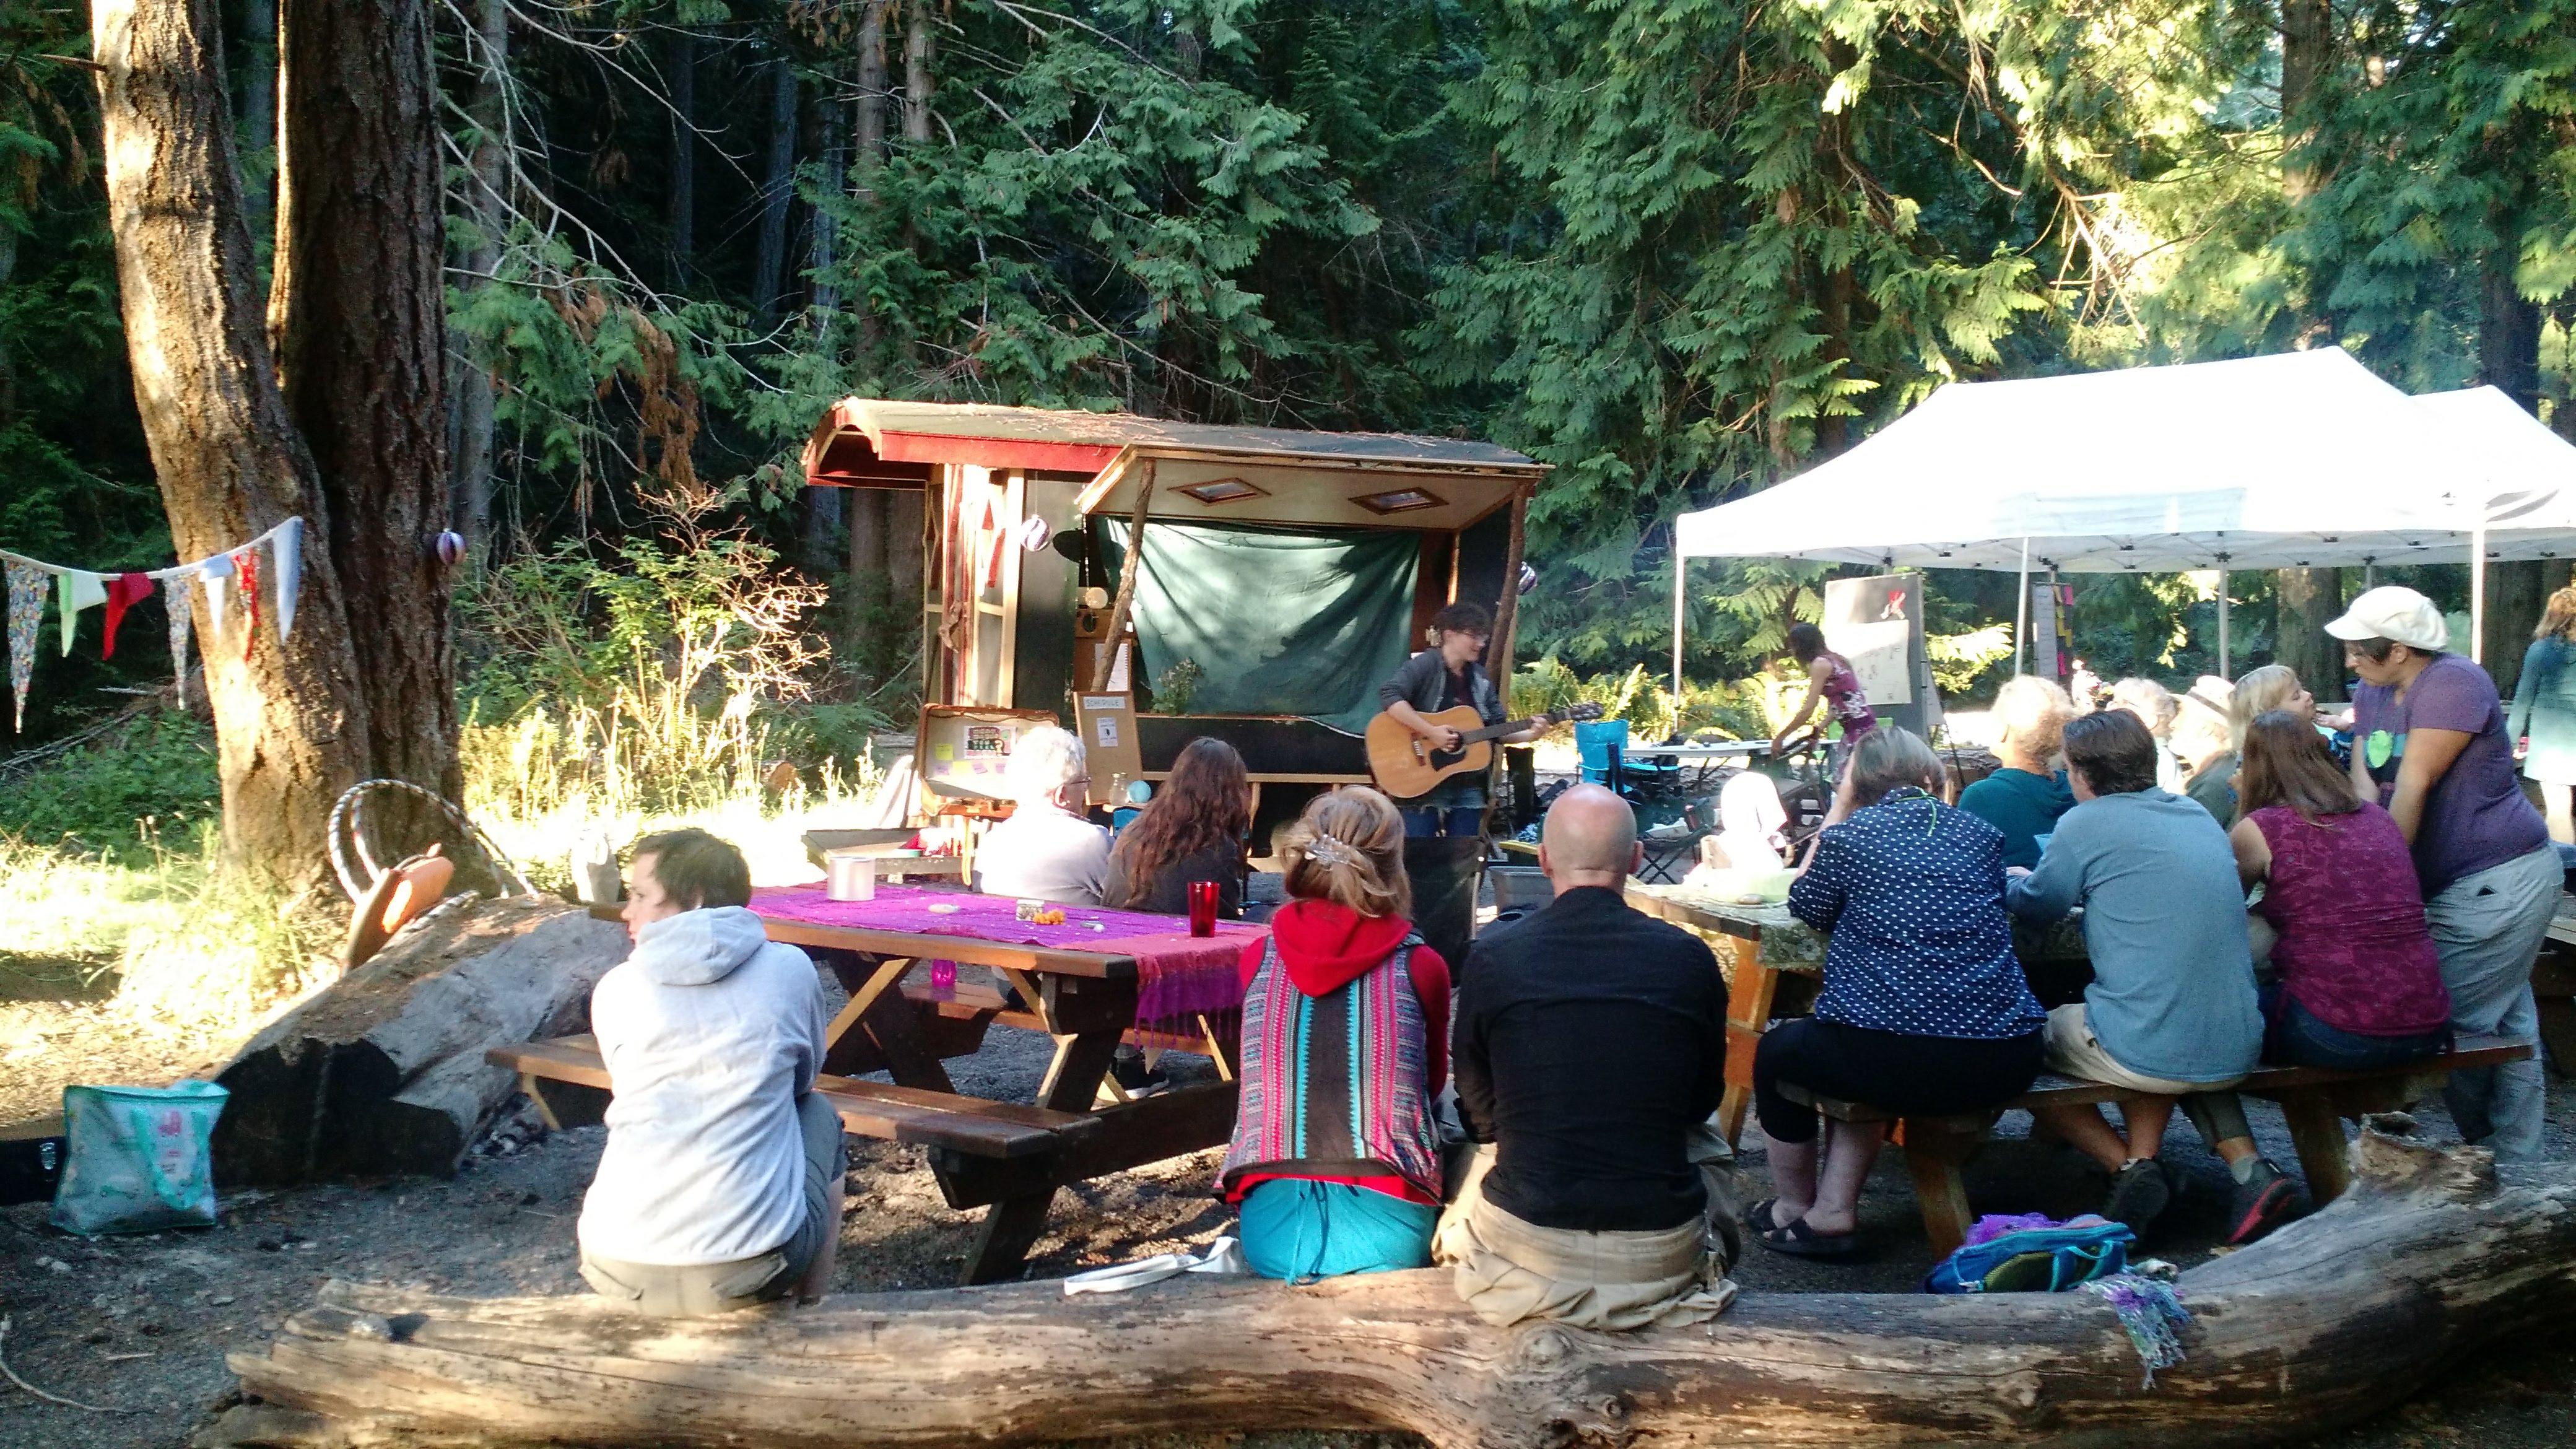 Gabriola NVC Summer Camp (Salish Sea Empathy Society, 2014 - 2019)